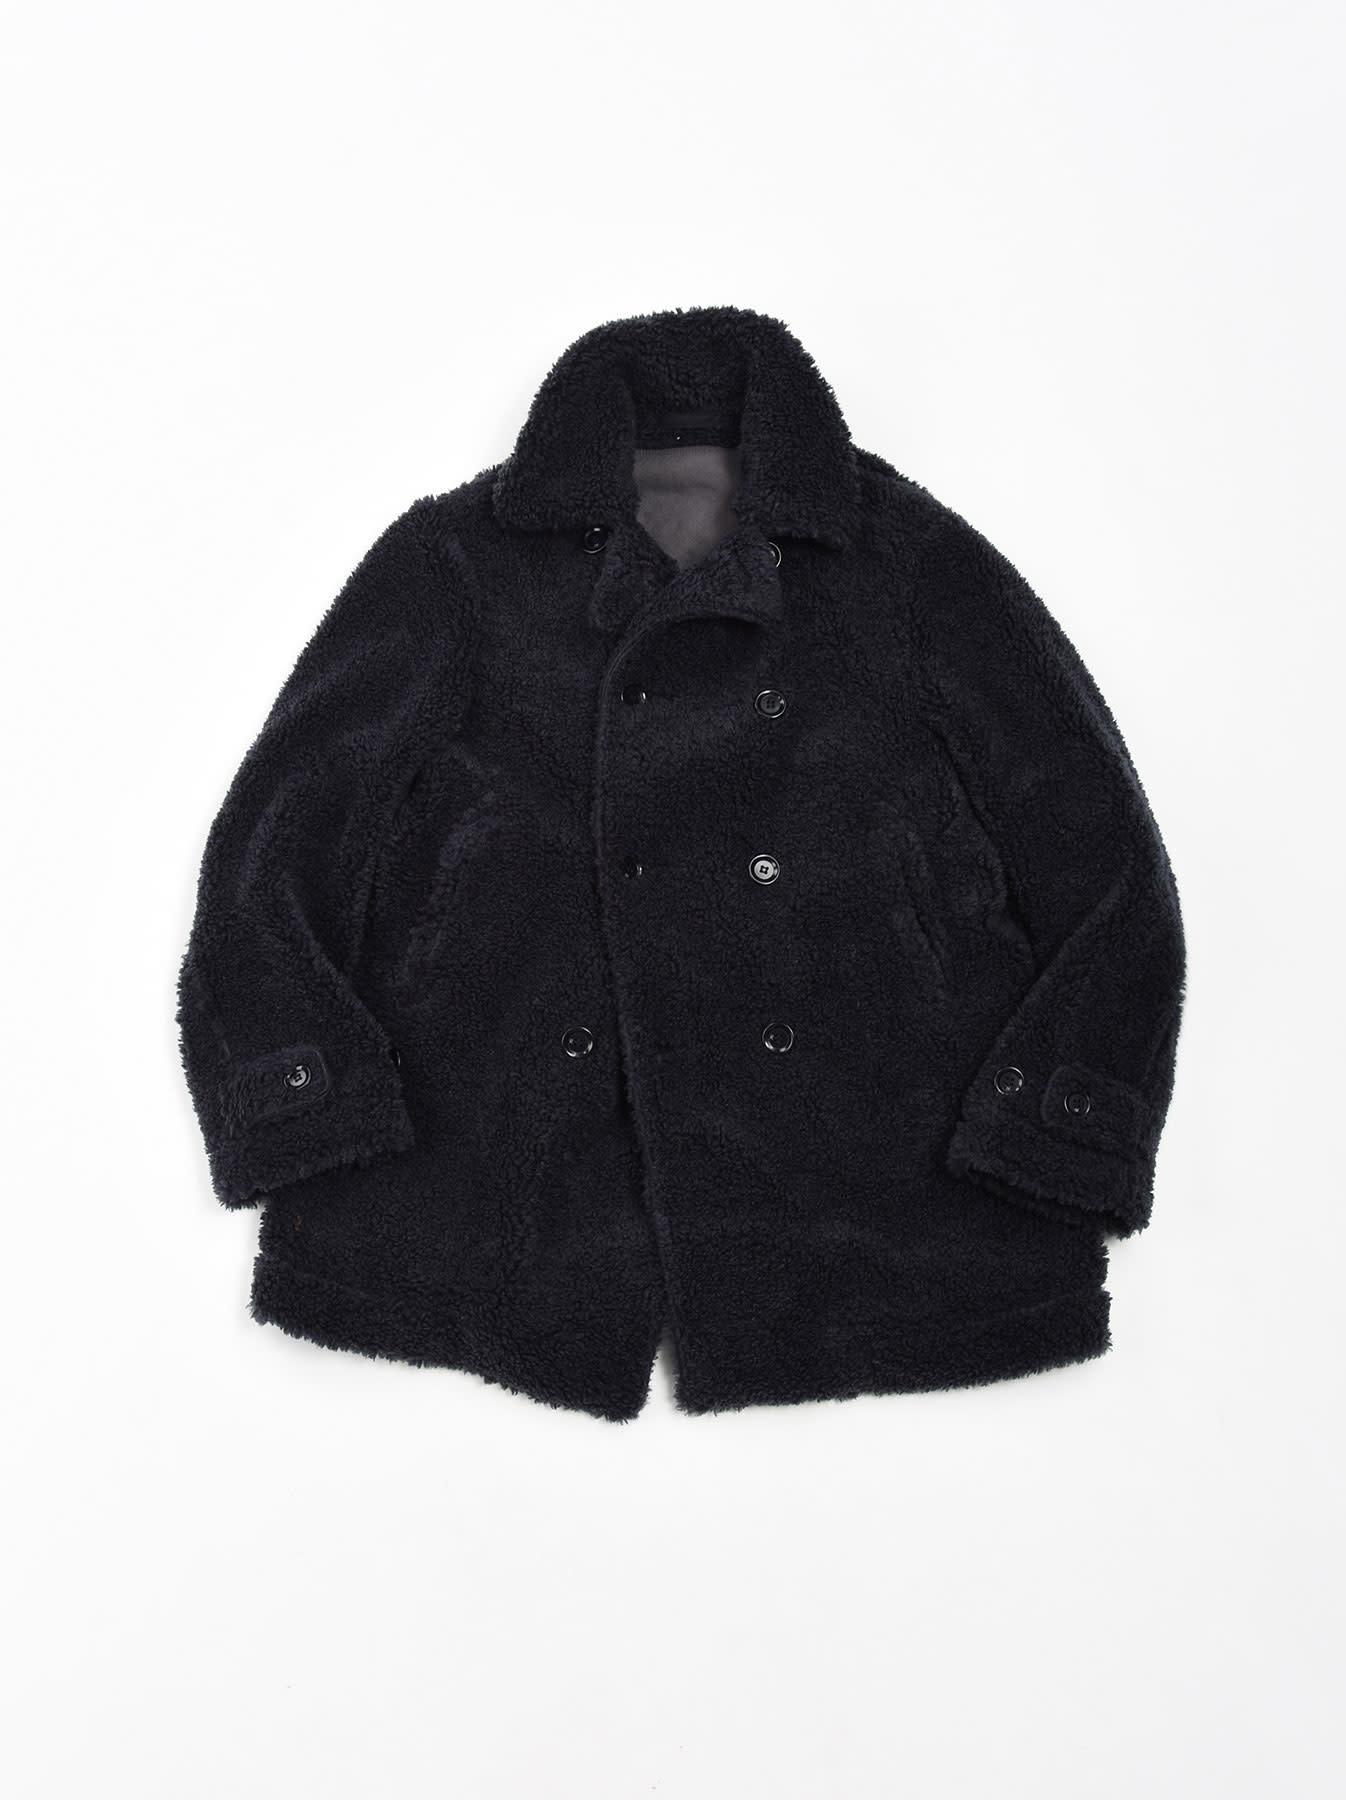 Sheep Boa 908 P-coat-1